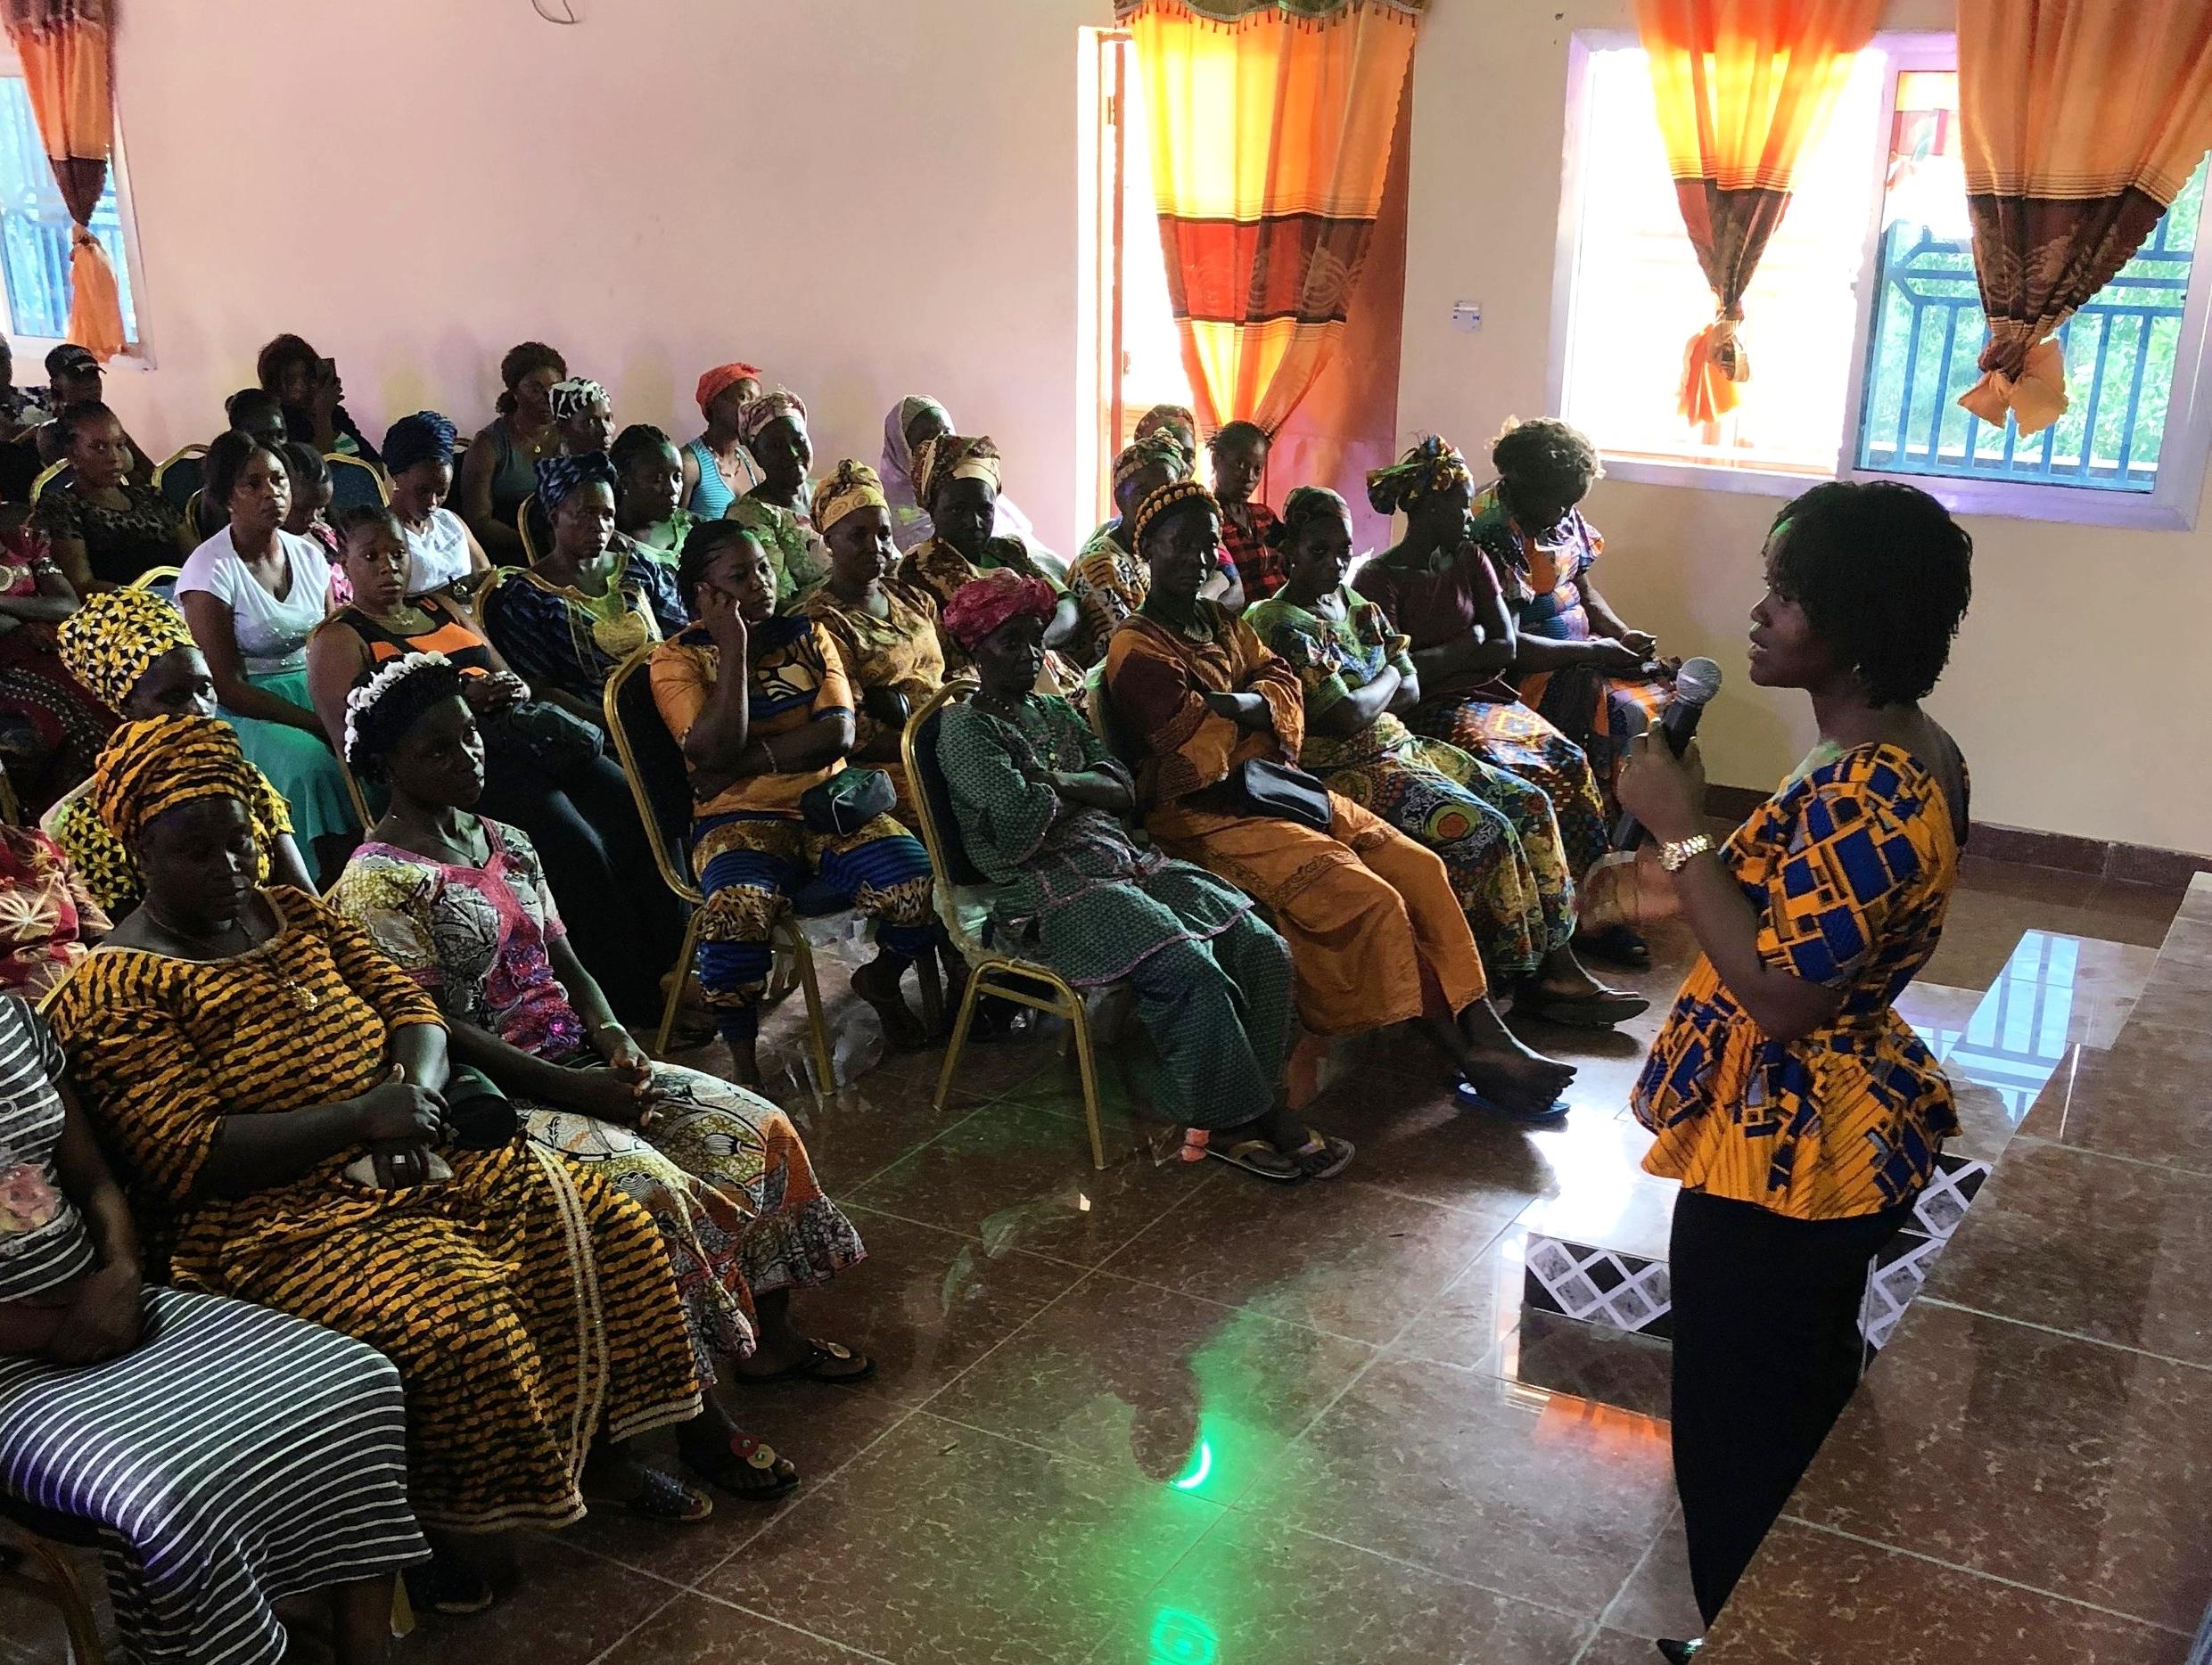 AIDS-Free World's Legal and Gender Associate, Saramba Kandeh addresses community members.  (Photo: ©AIDS-Free World)